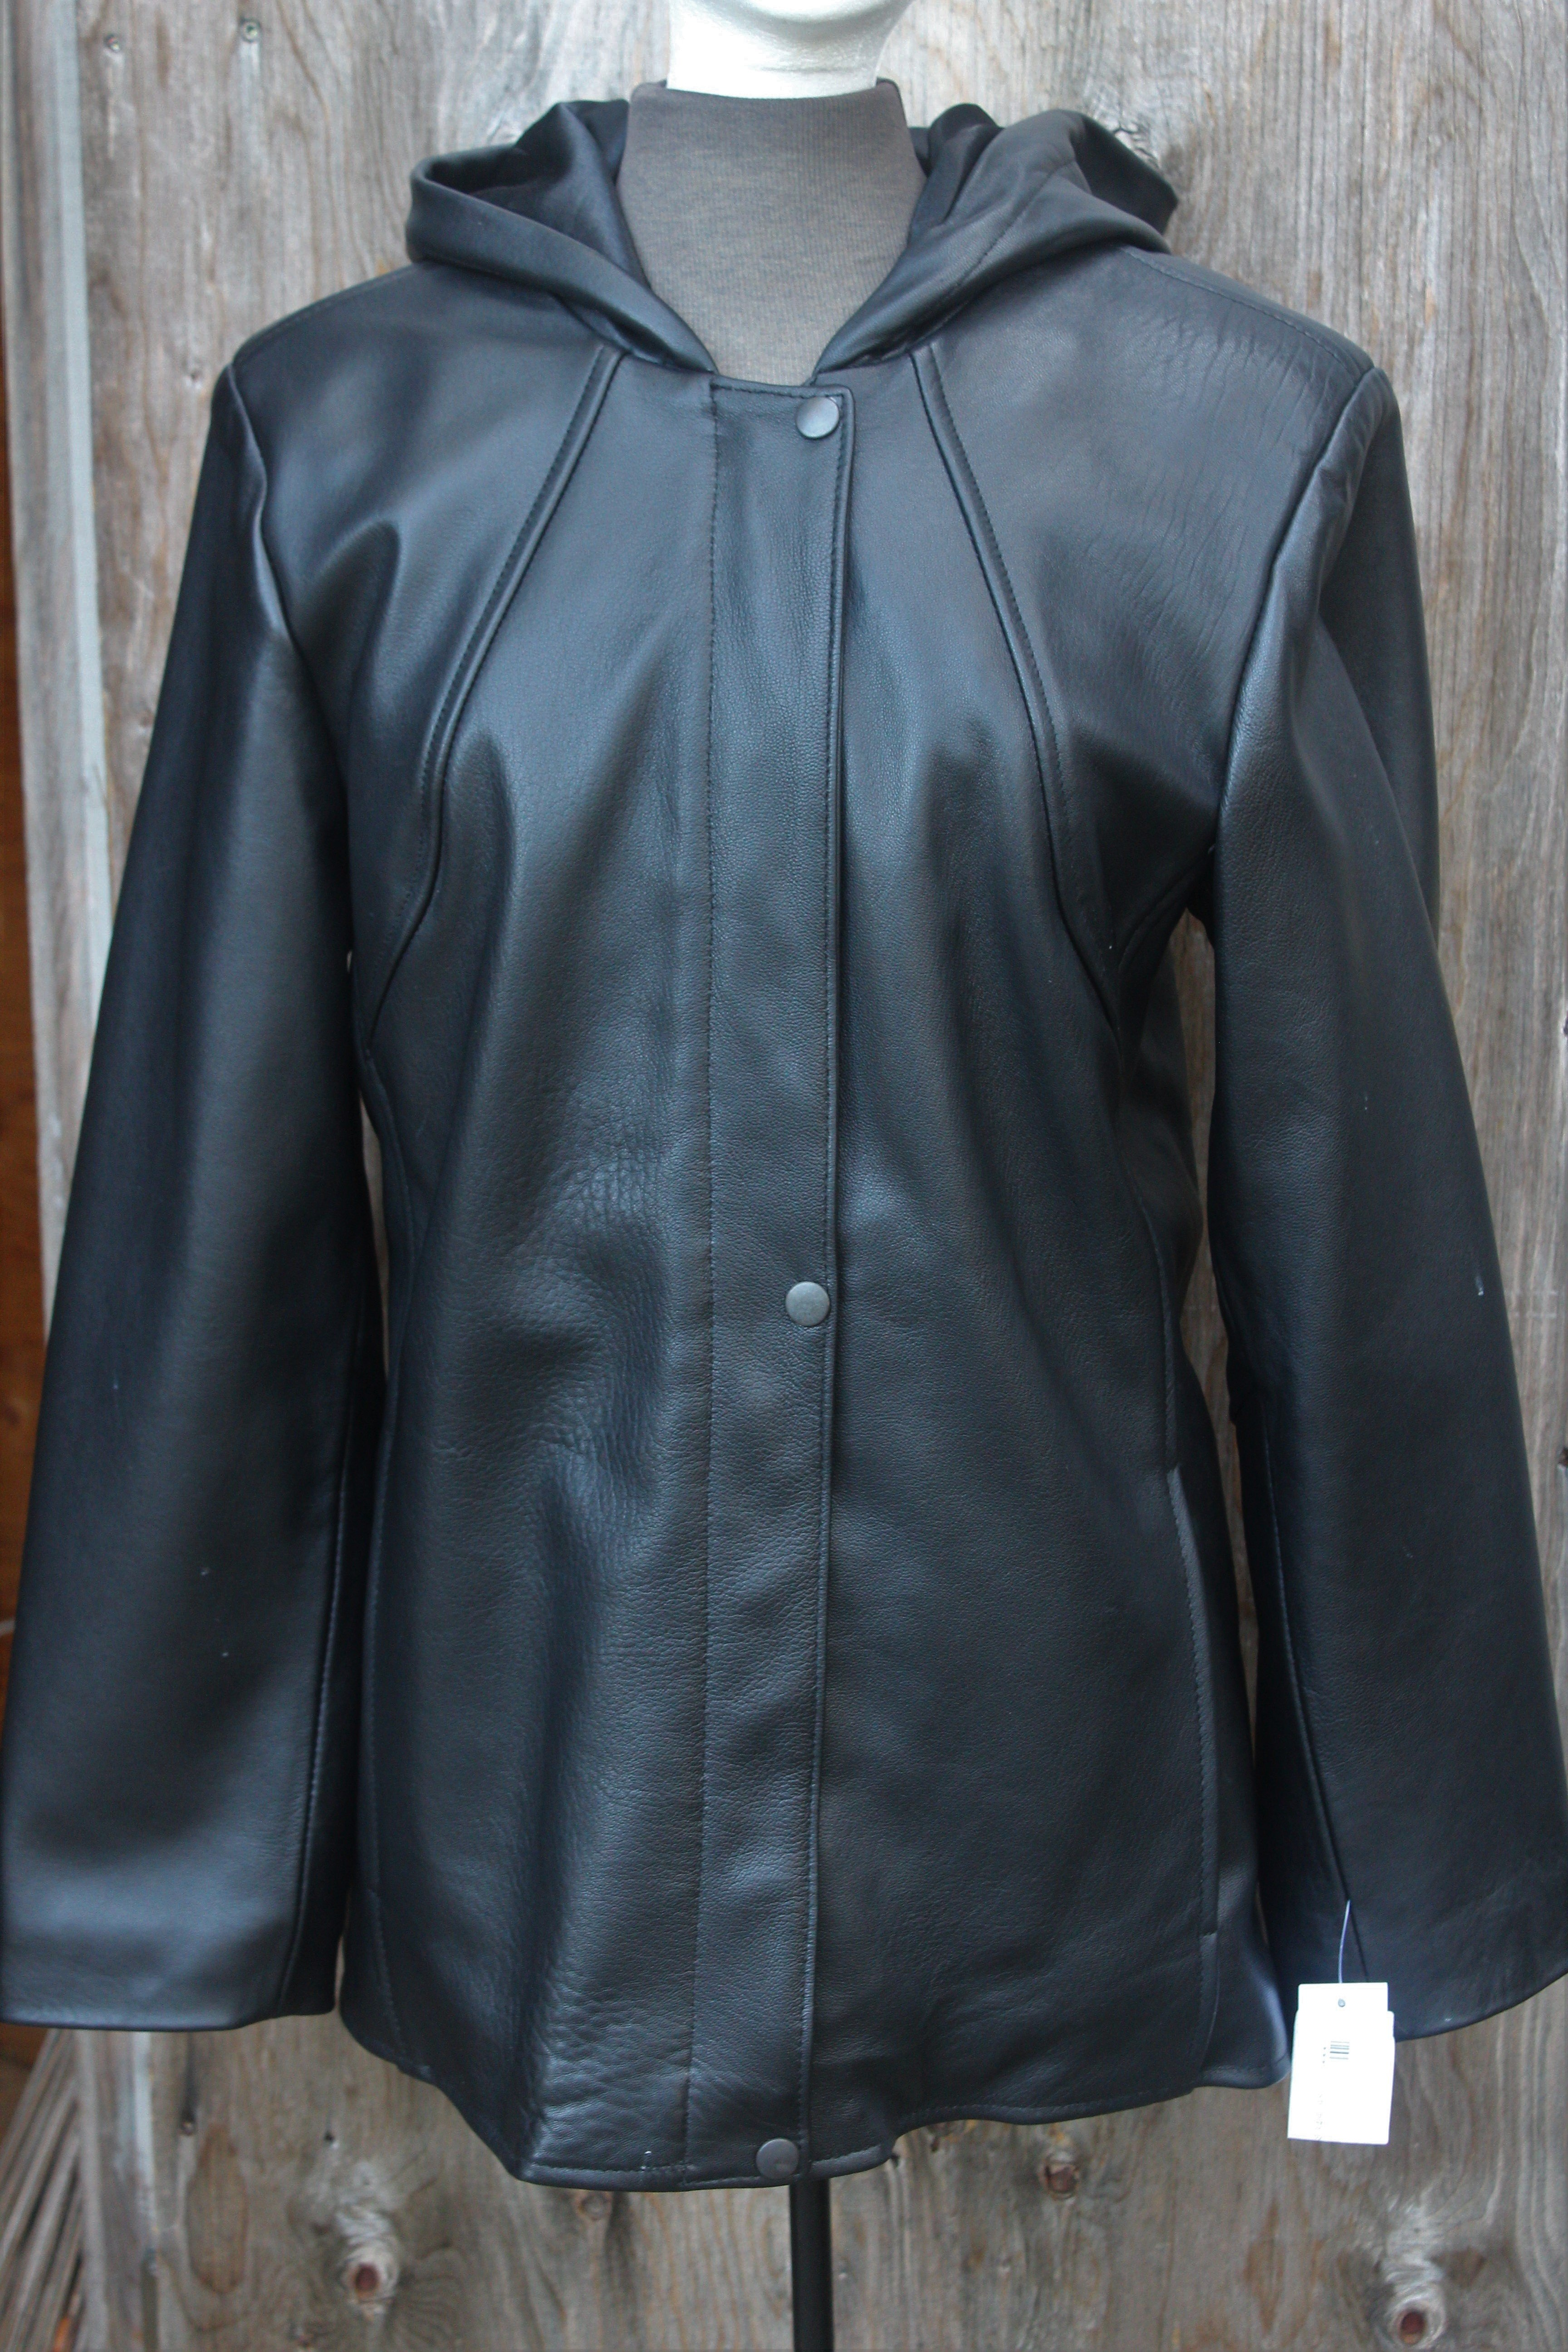 Black- $349.95 Bainton's: Style #2012